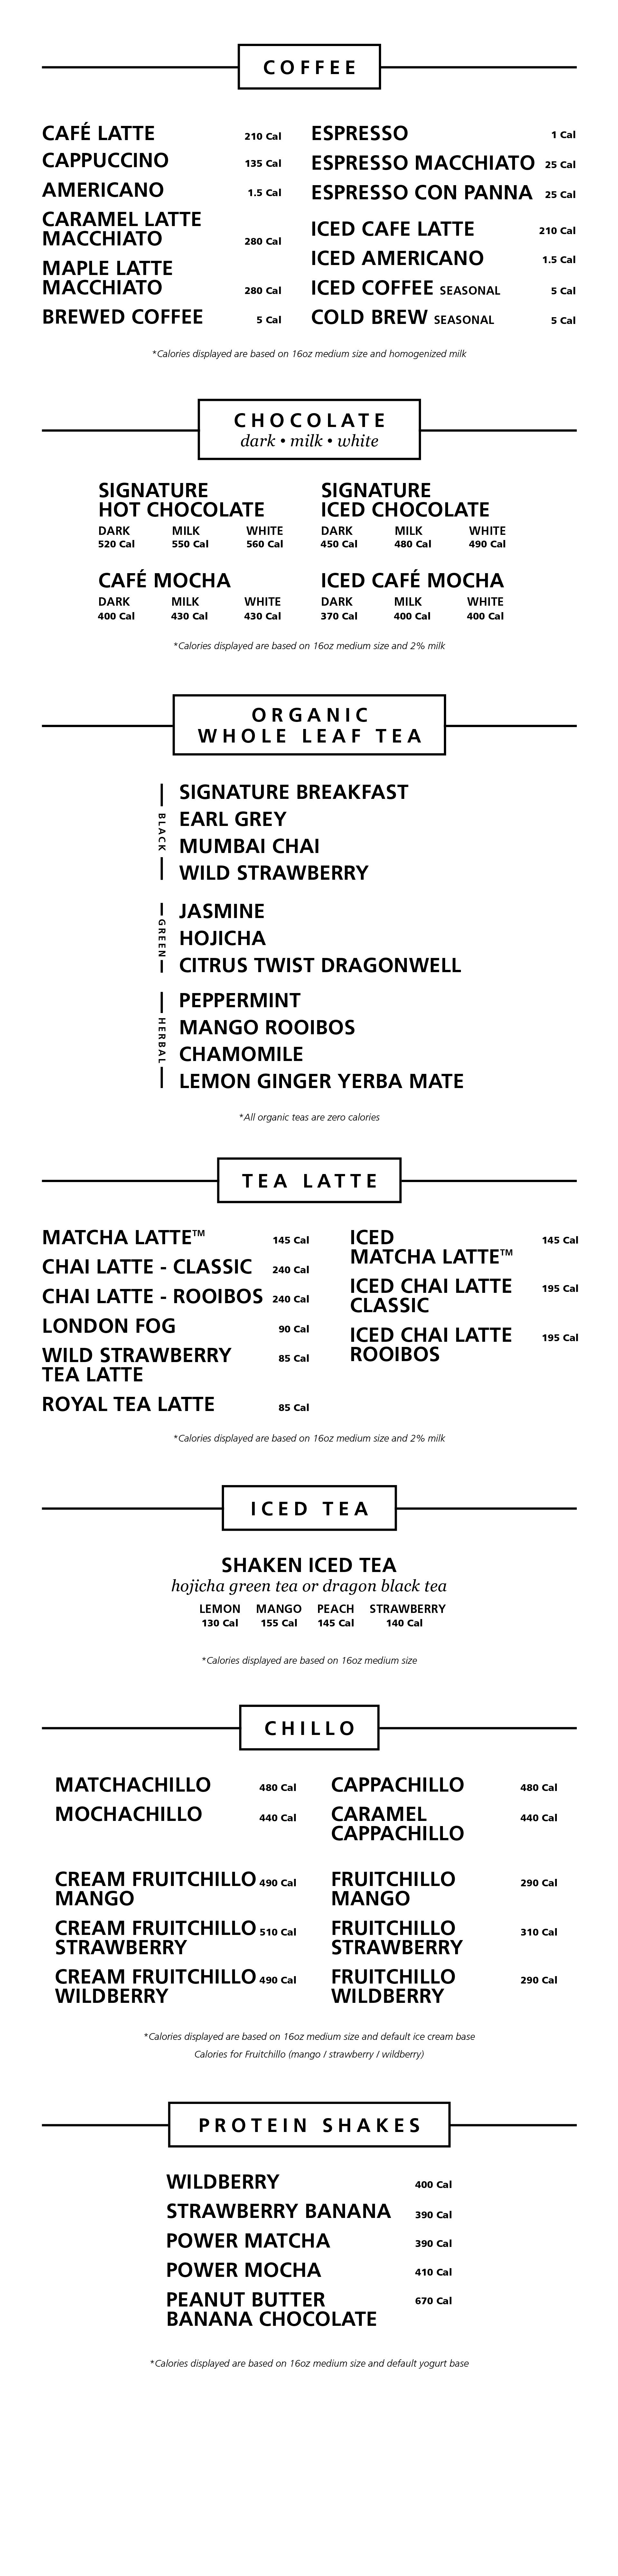 Blenz Coffee Beverages